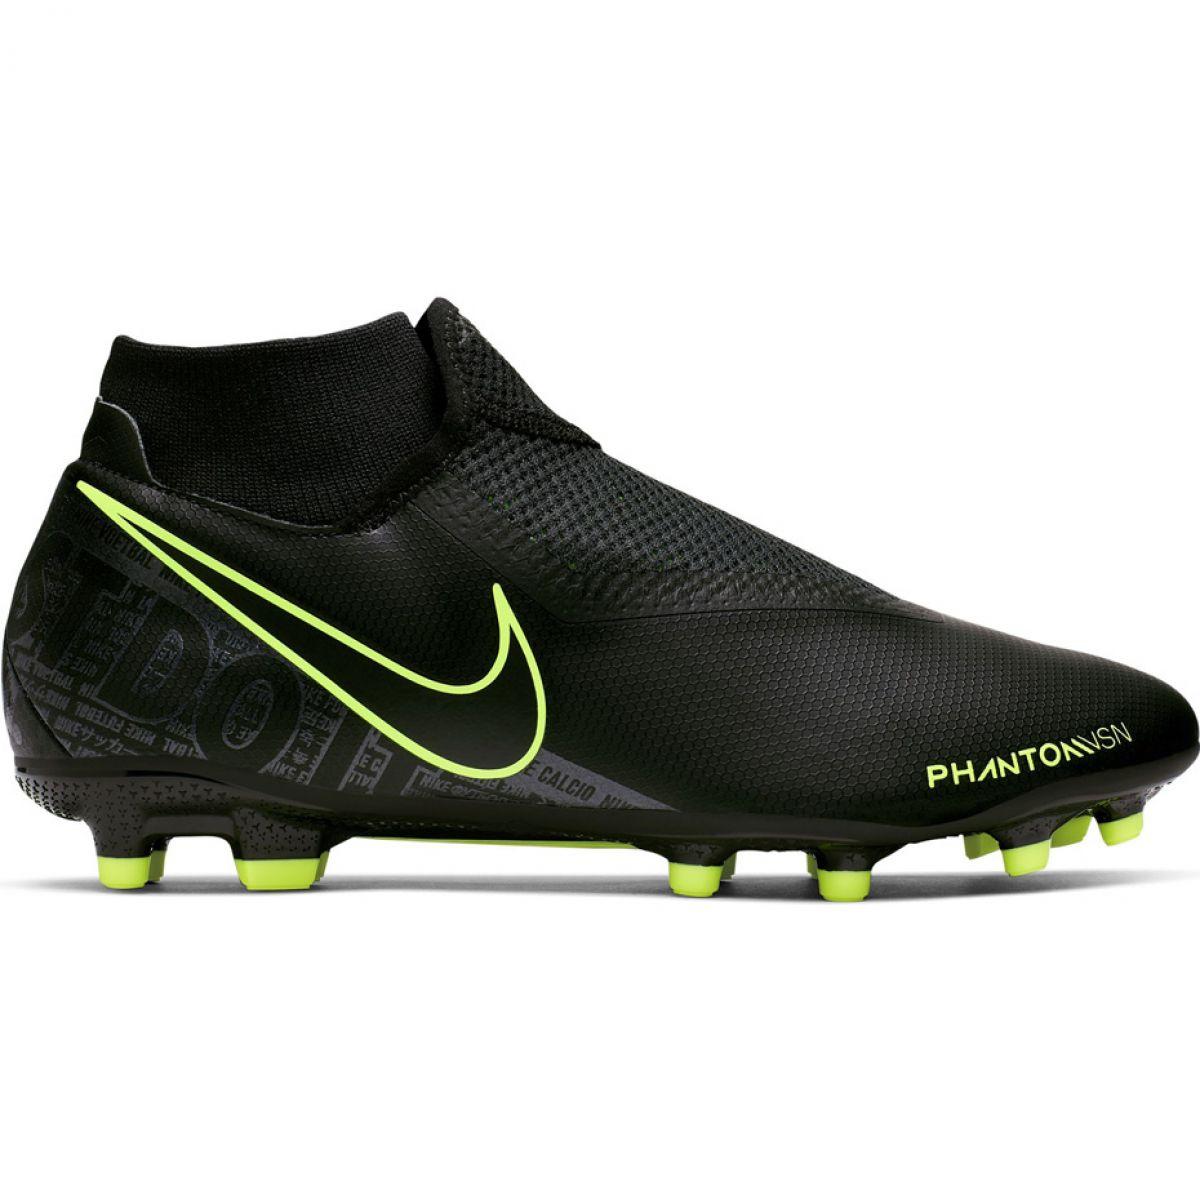 Dettagli su Scarpe da calcio Nike Phantom Vsn Academy Df FG MG M AO3258 007 nero nero